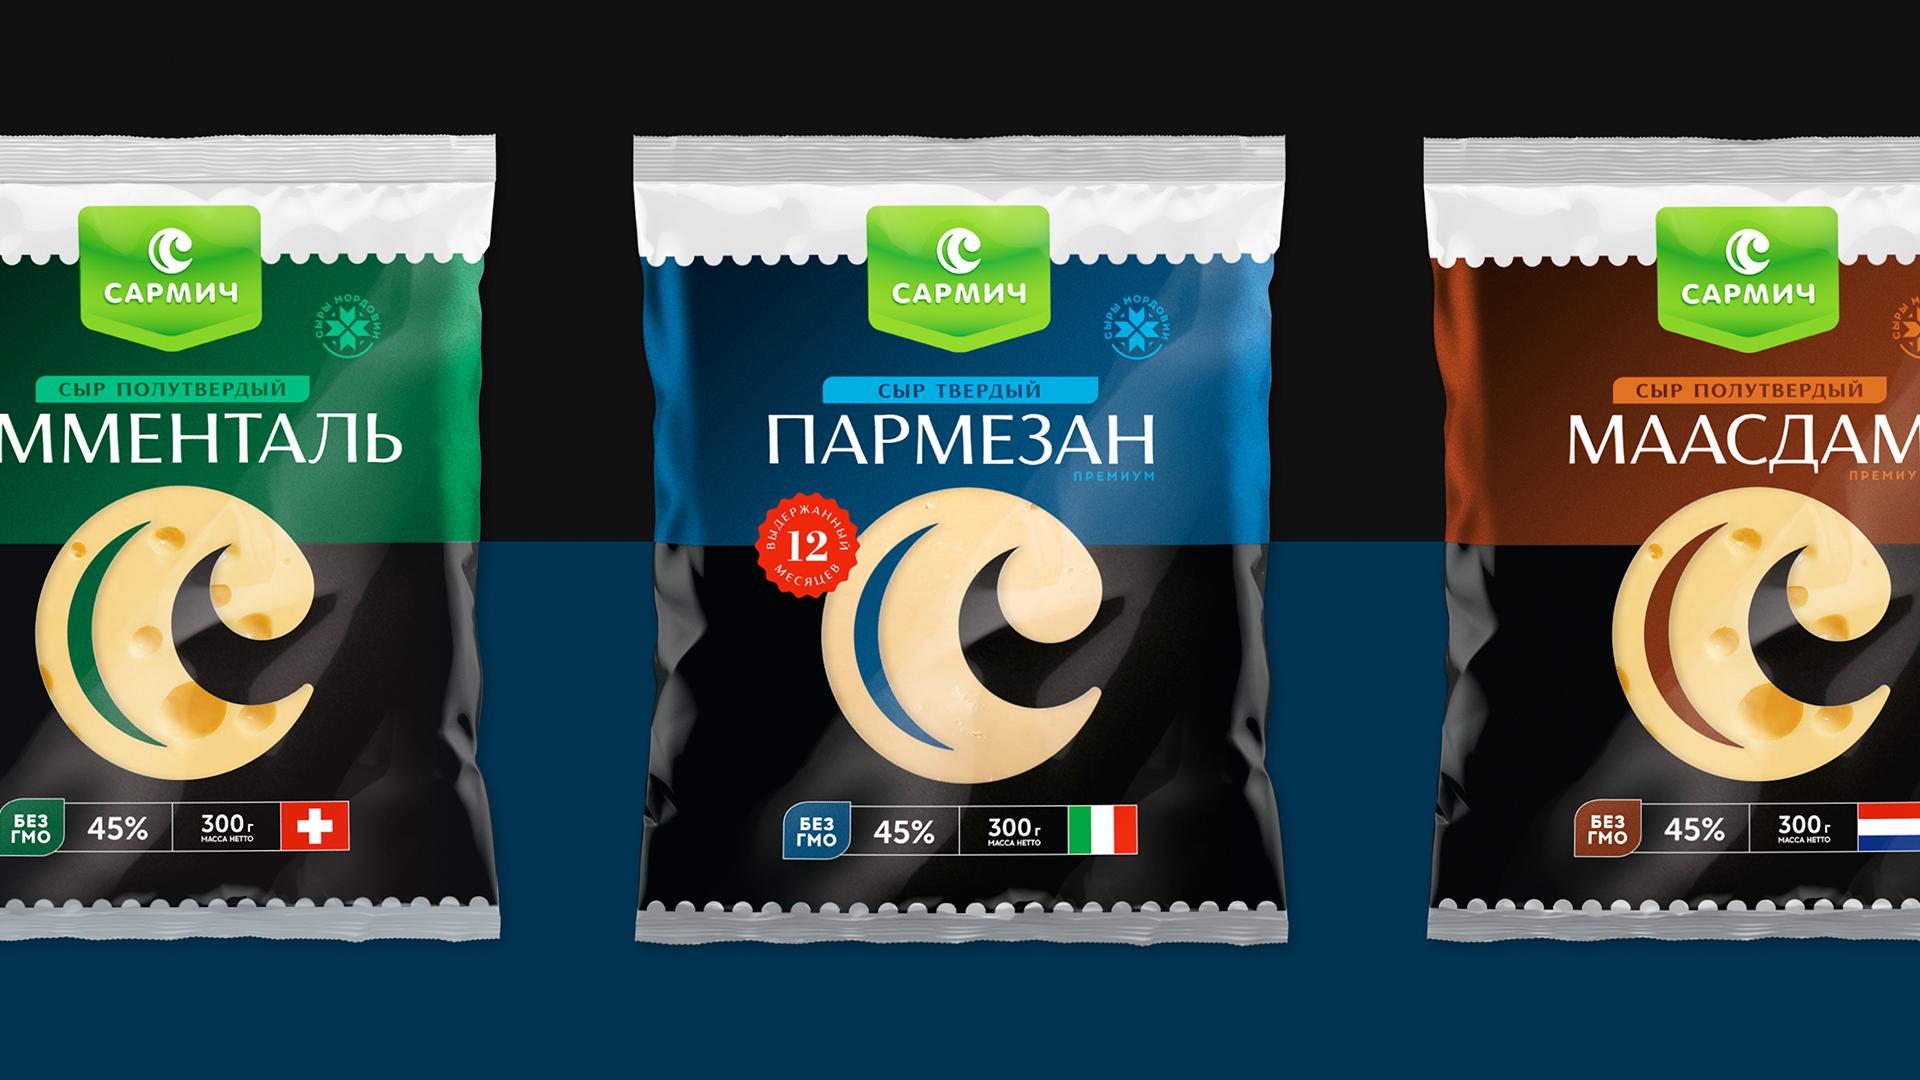 Асгард брендинг, design, trademark, premium packaging design, logo design, Parmesan